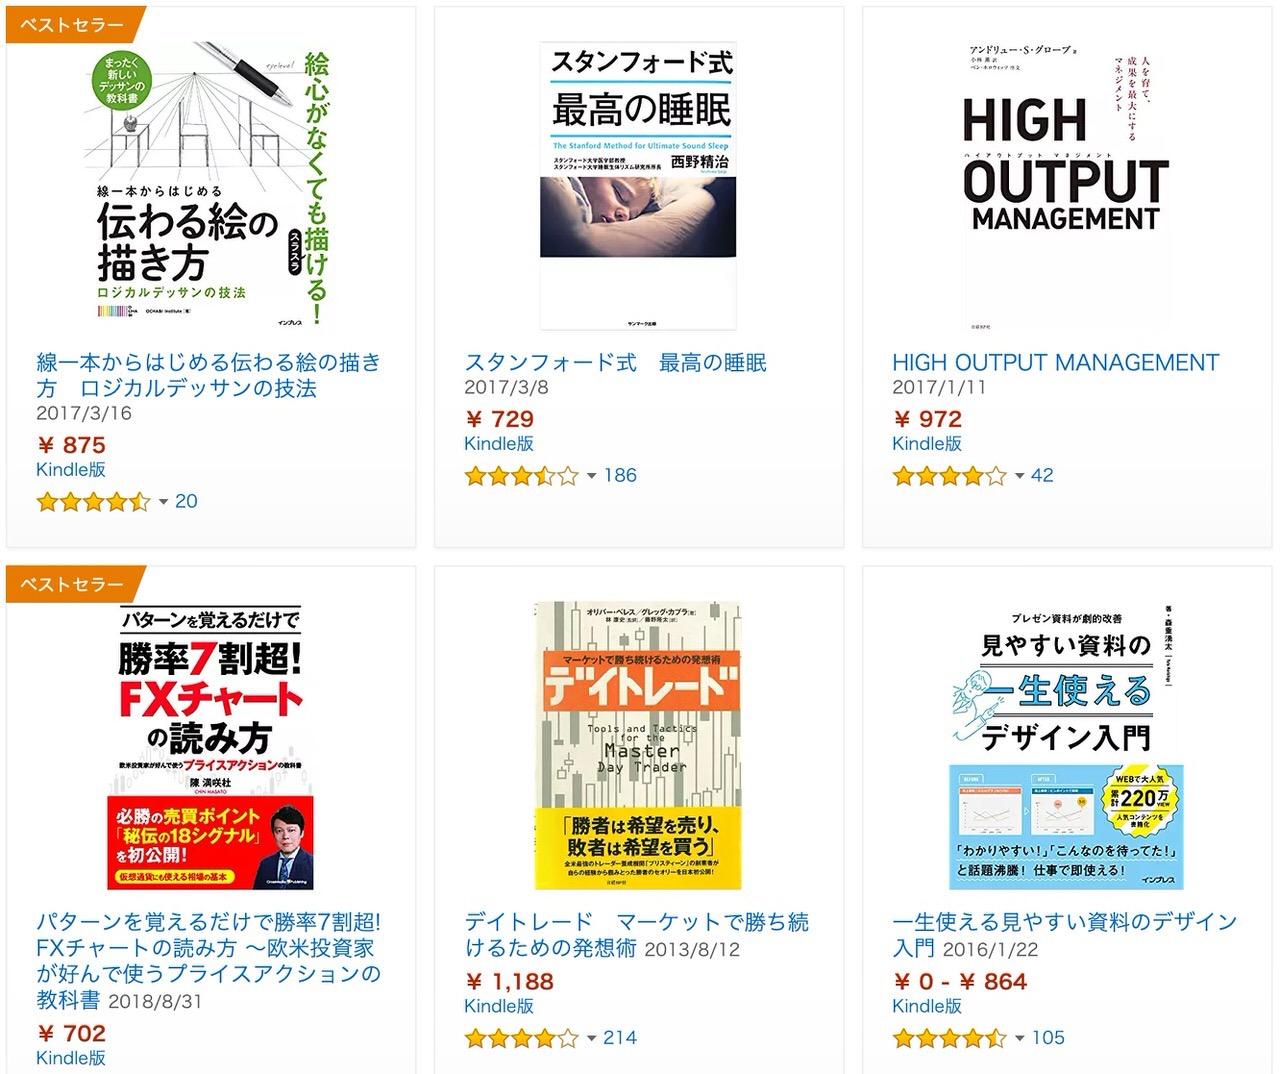 【Kindleセール】5,000冊以上が対象!50%OFF「ビジネス・実用書フェア」(2/8まで)